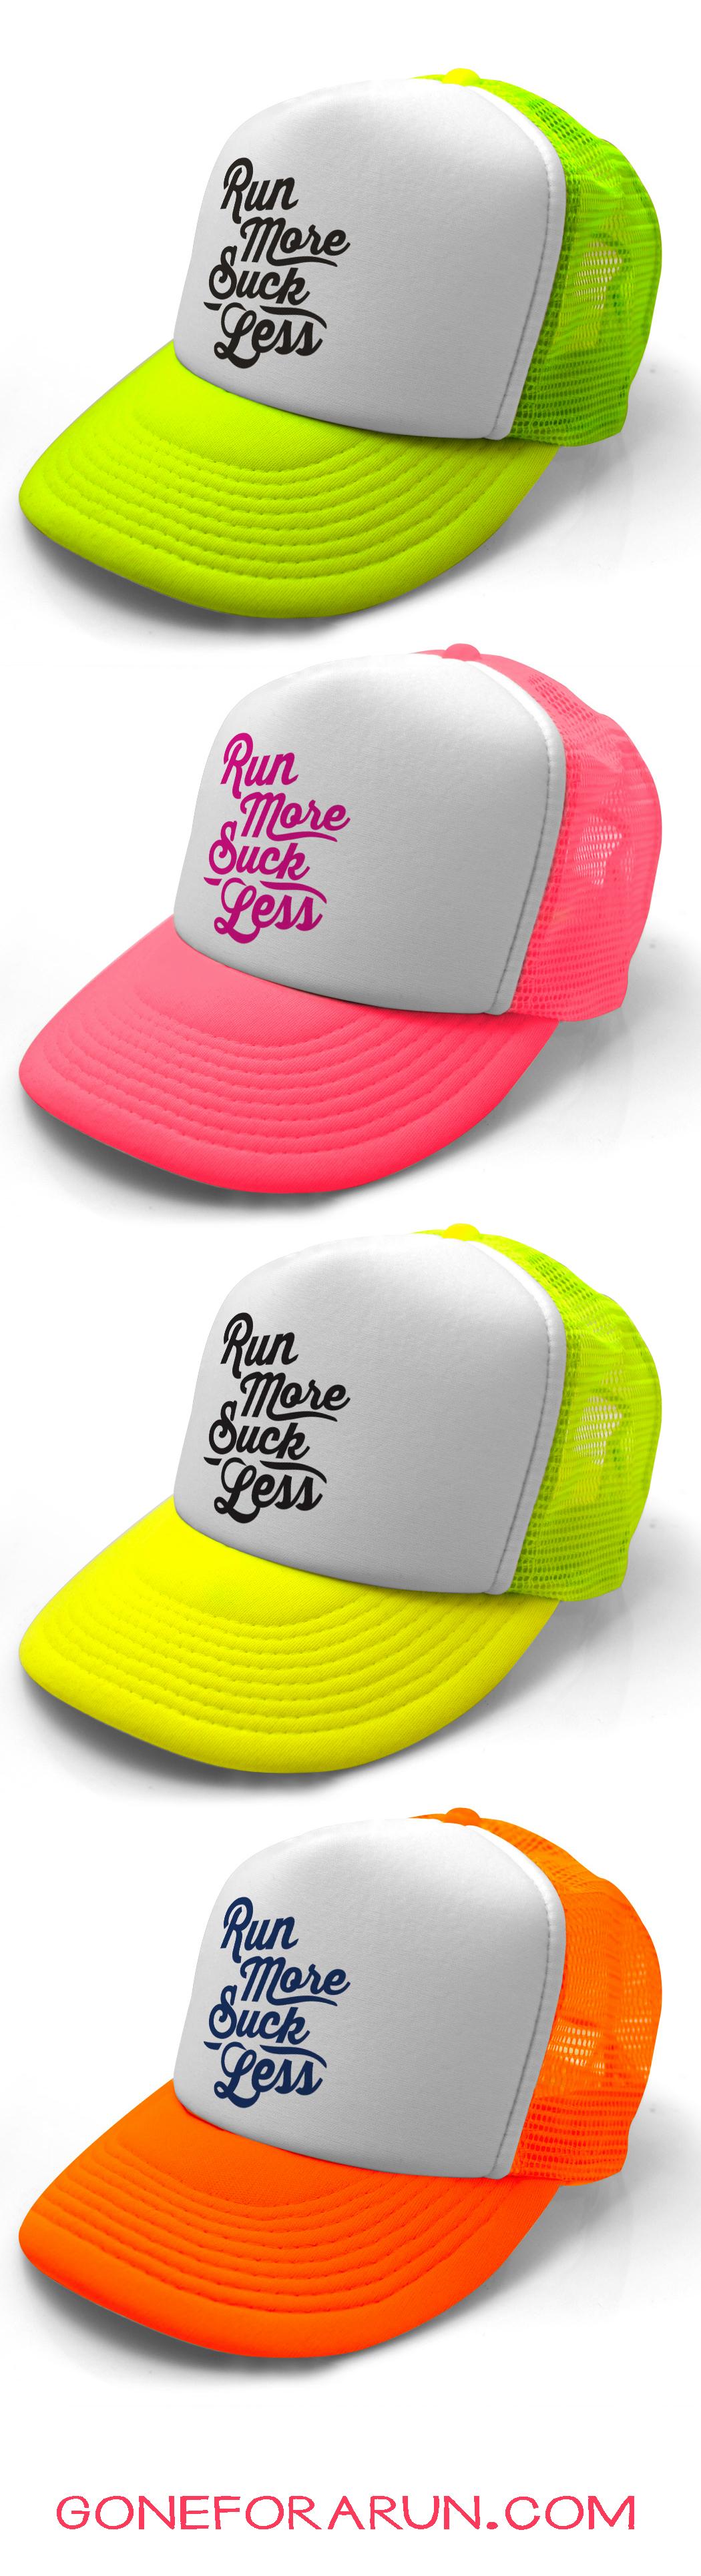 Trucker Hats For Runners Trucker Hat Running Trucker Hats